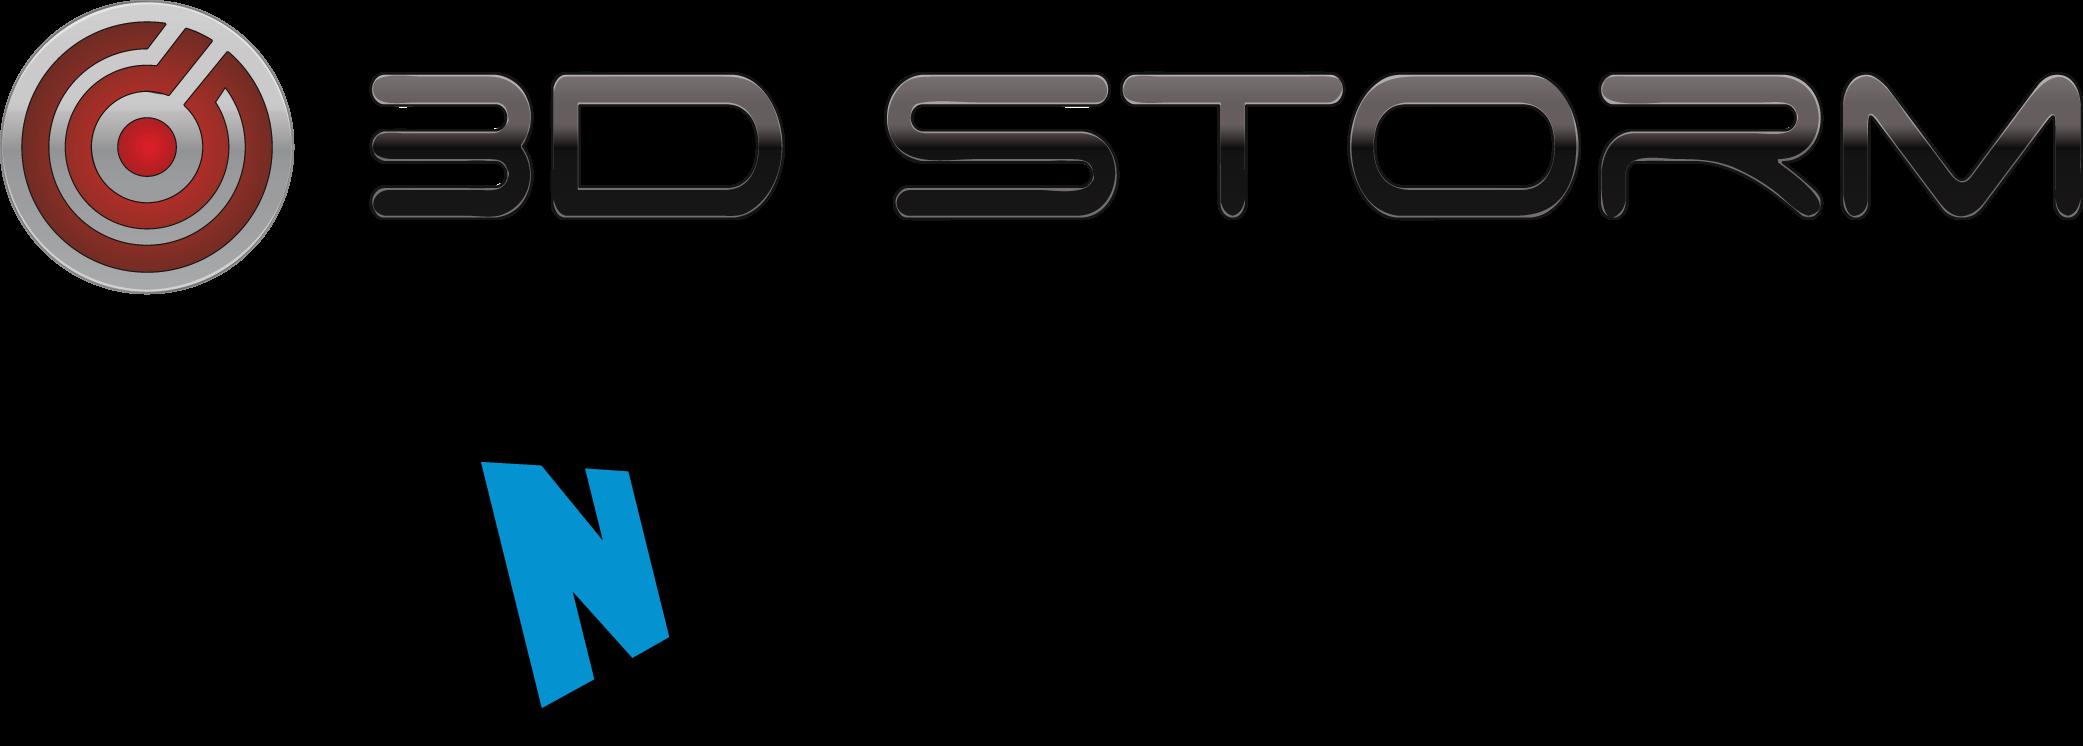 3D Storm - NewTek